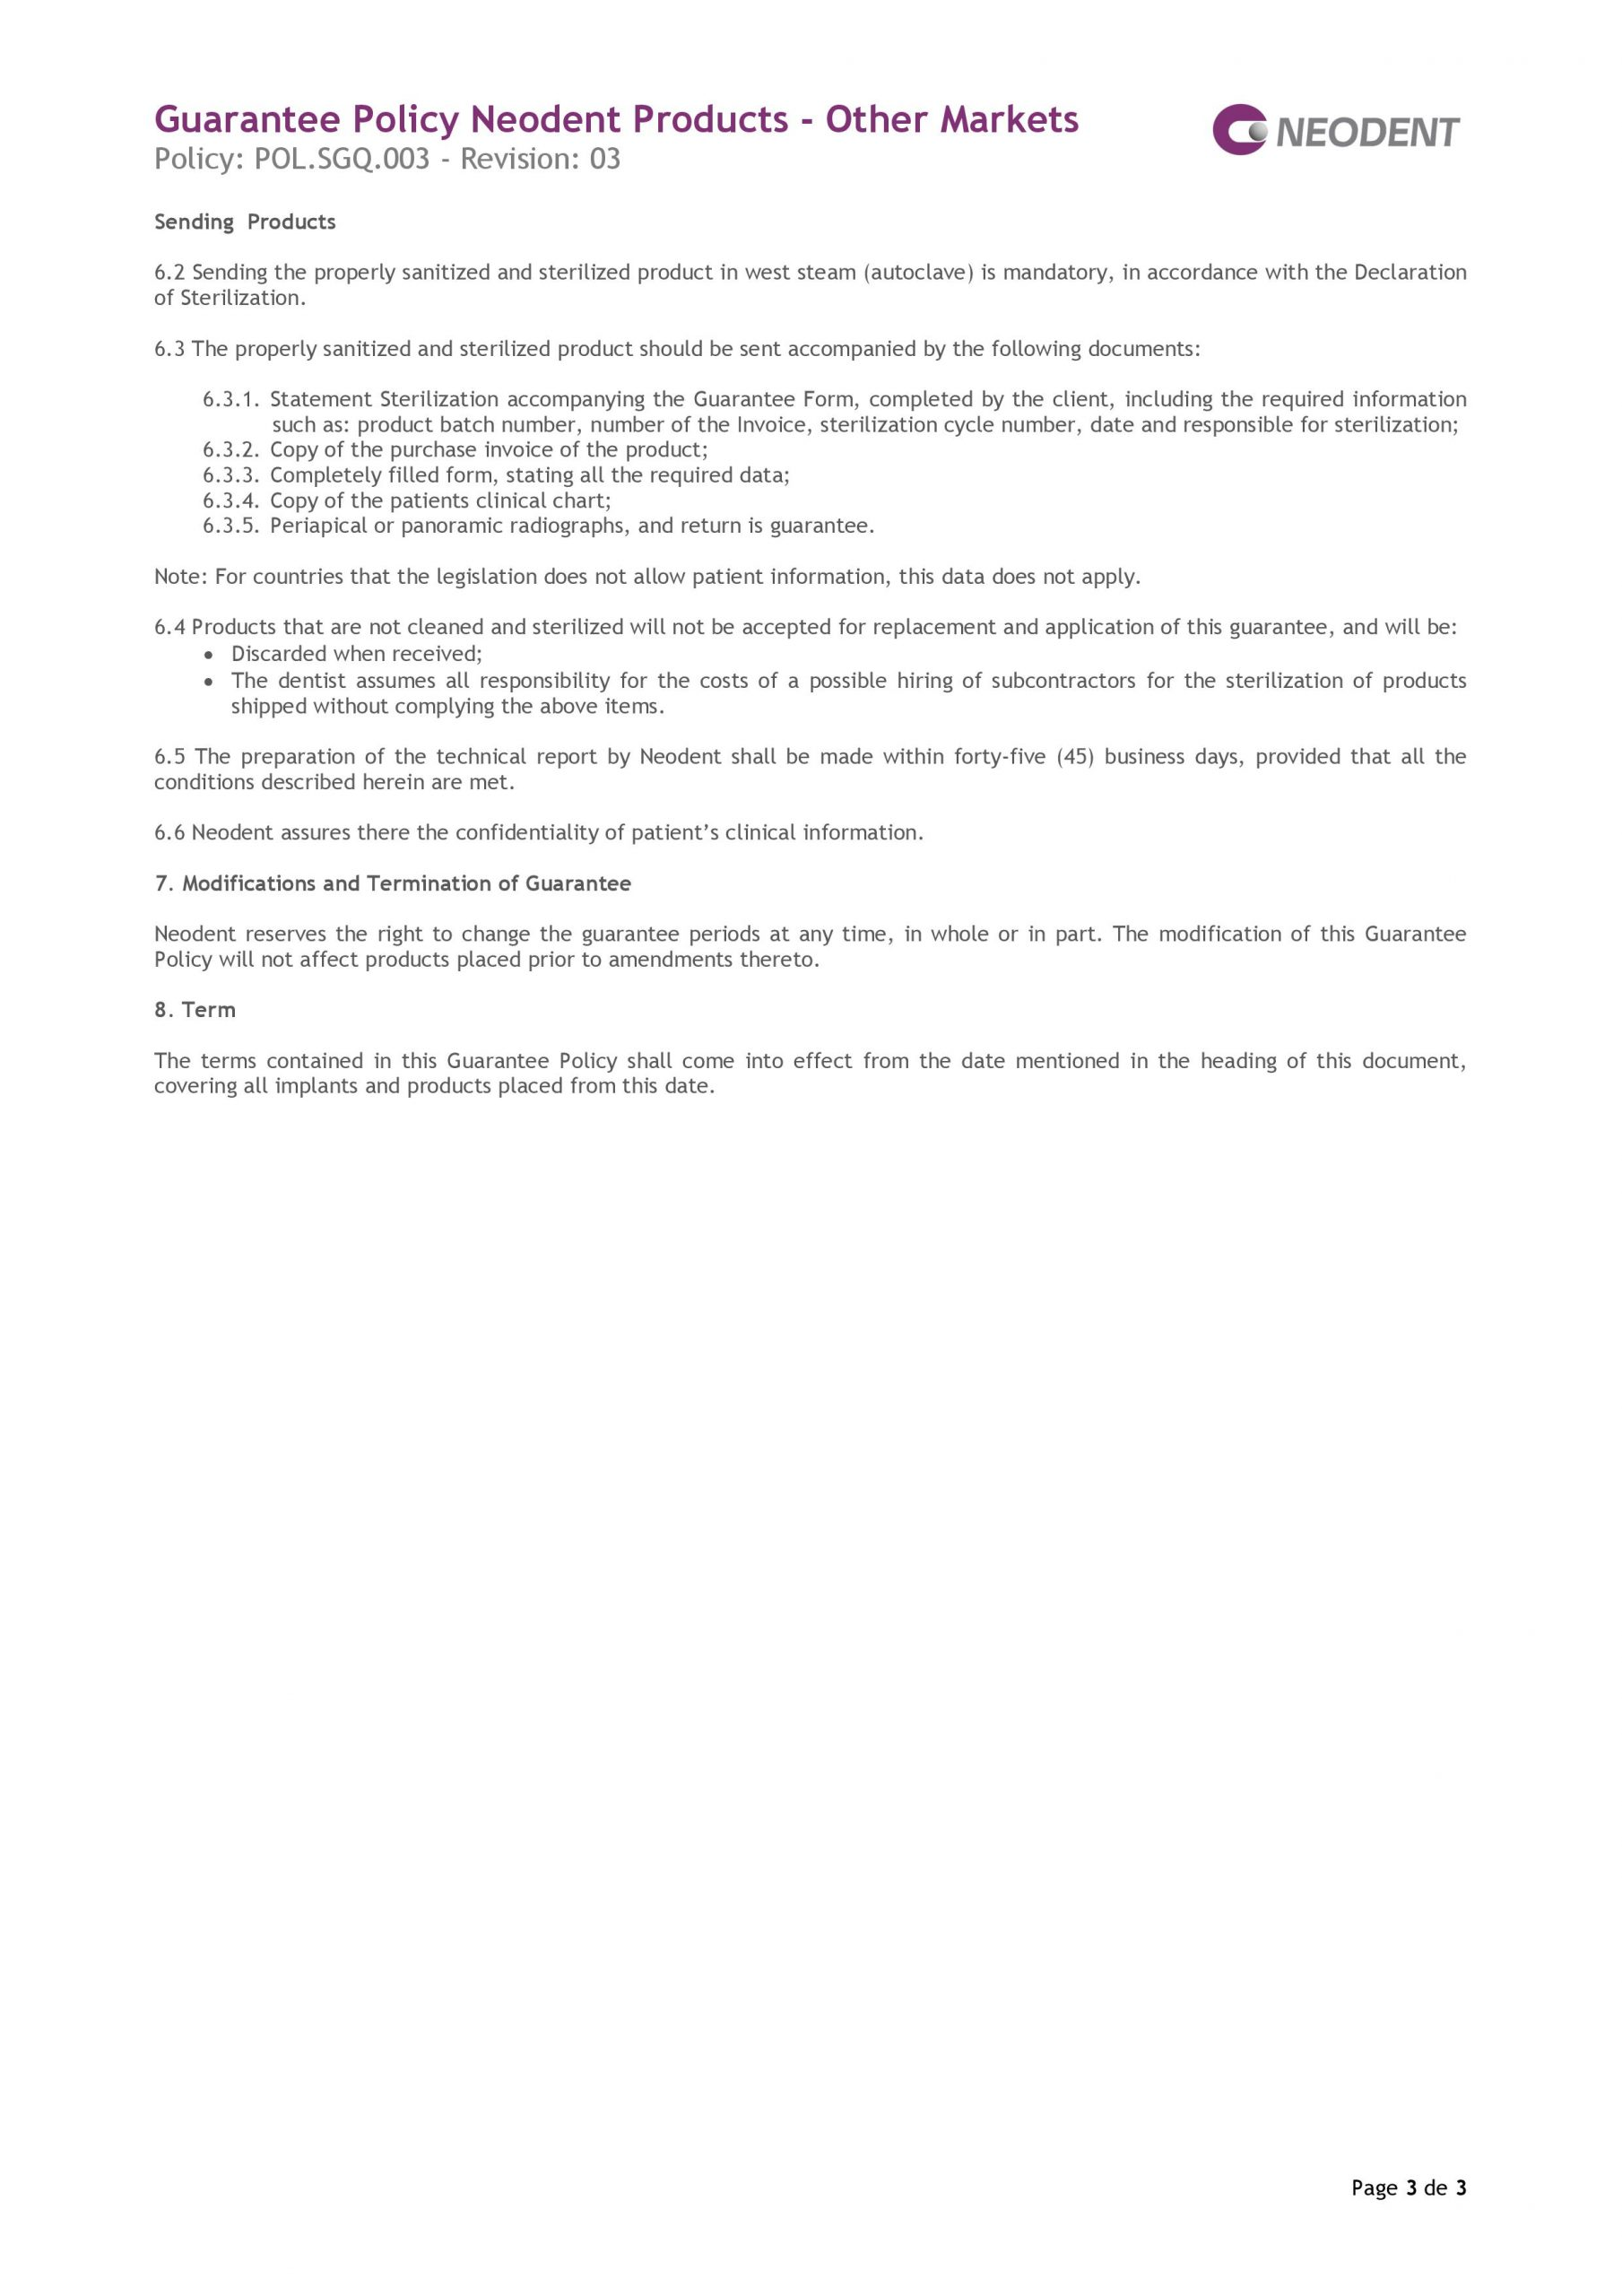 politica-garantie-implant-neodent